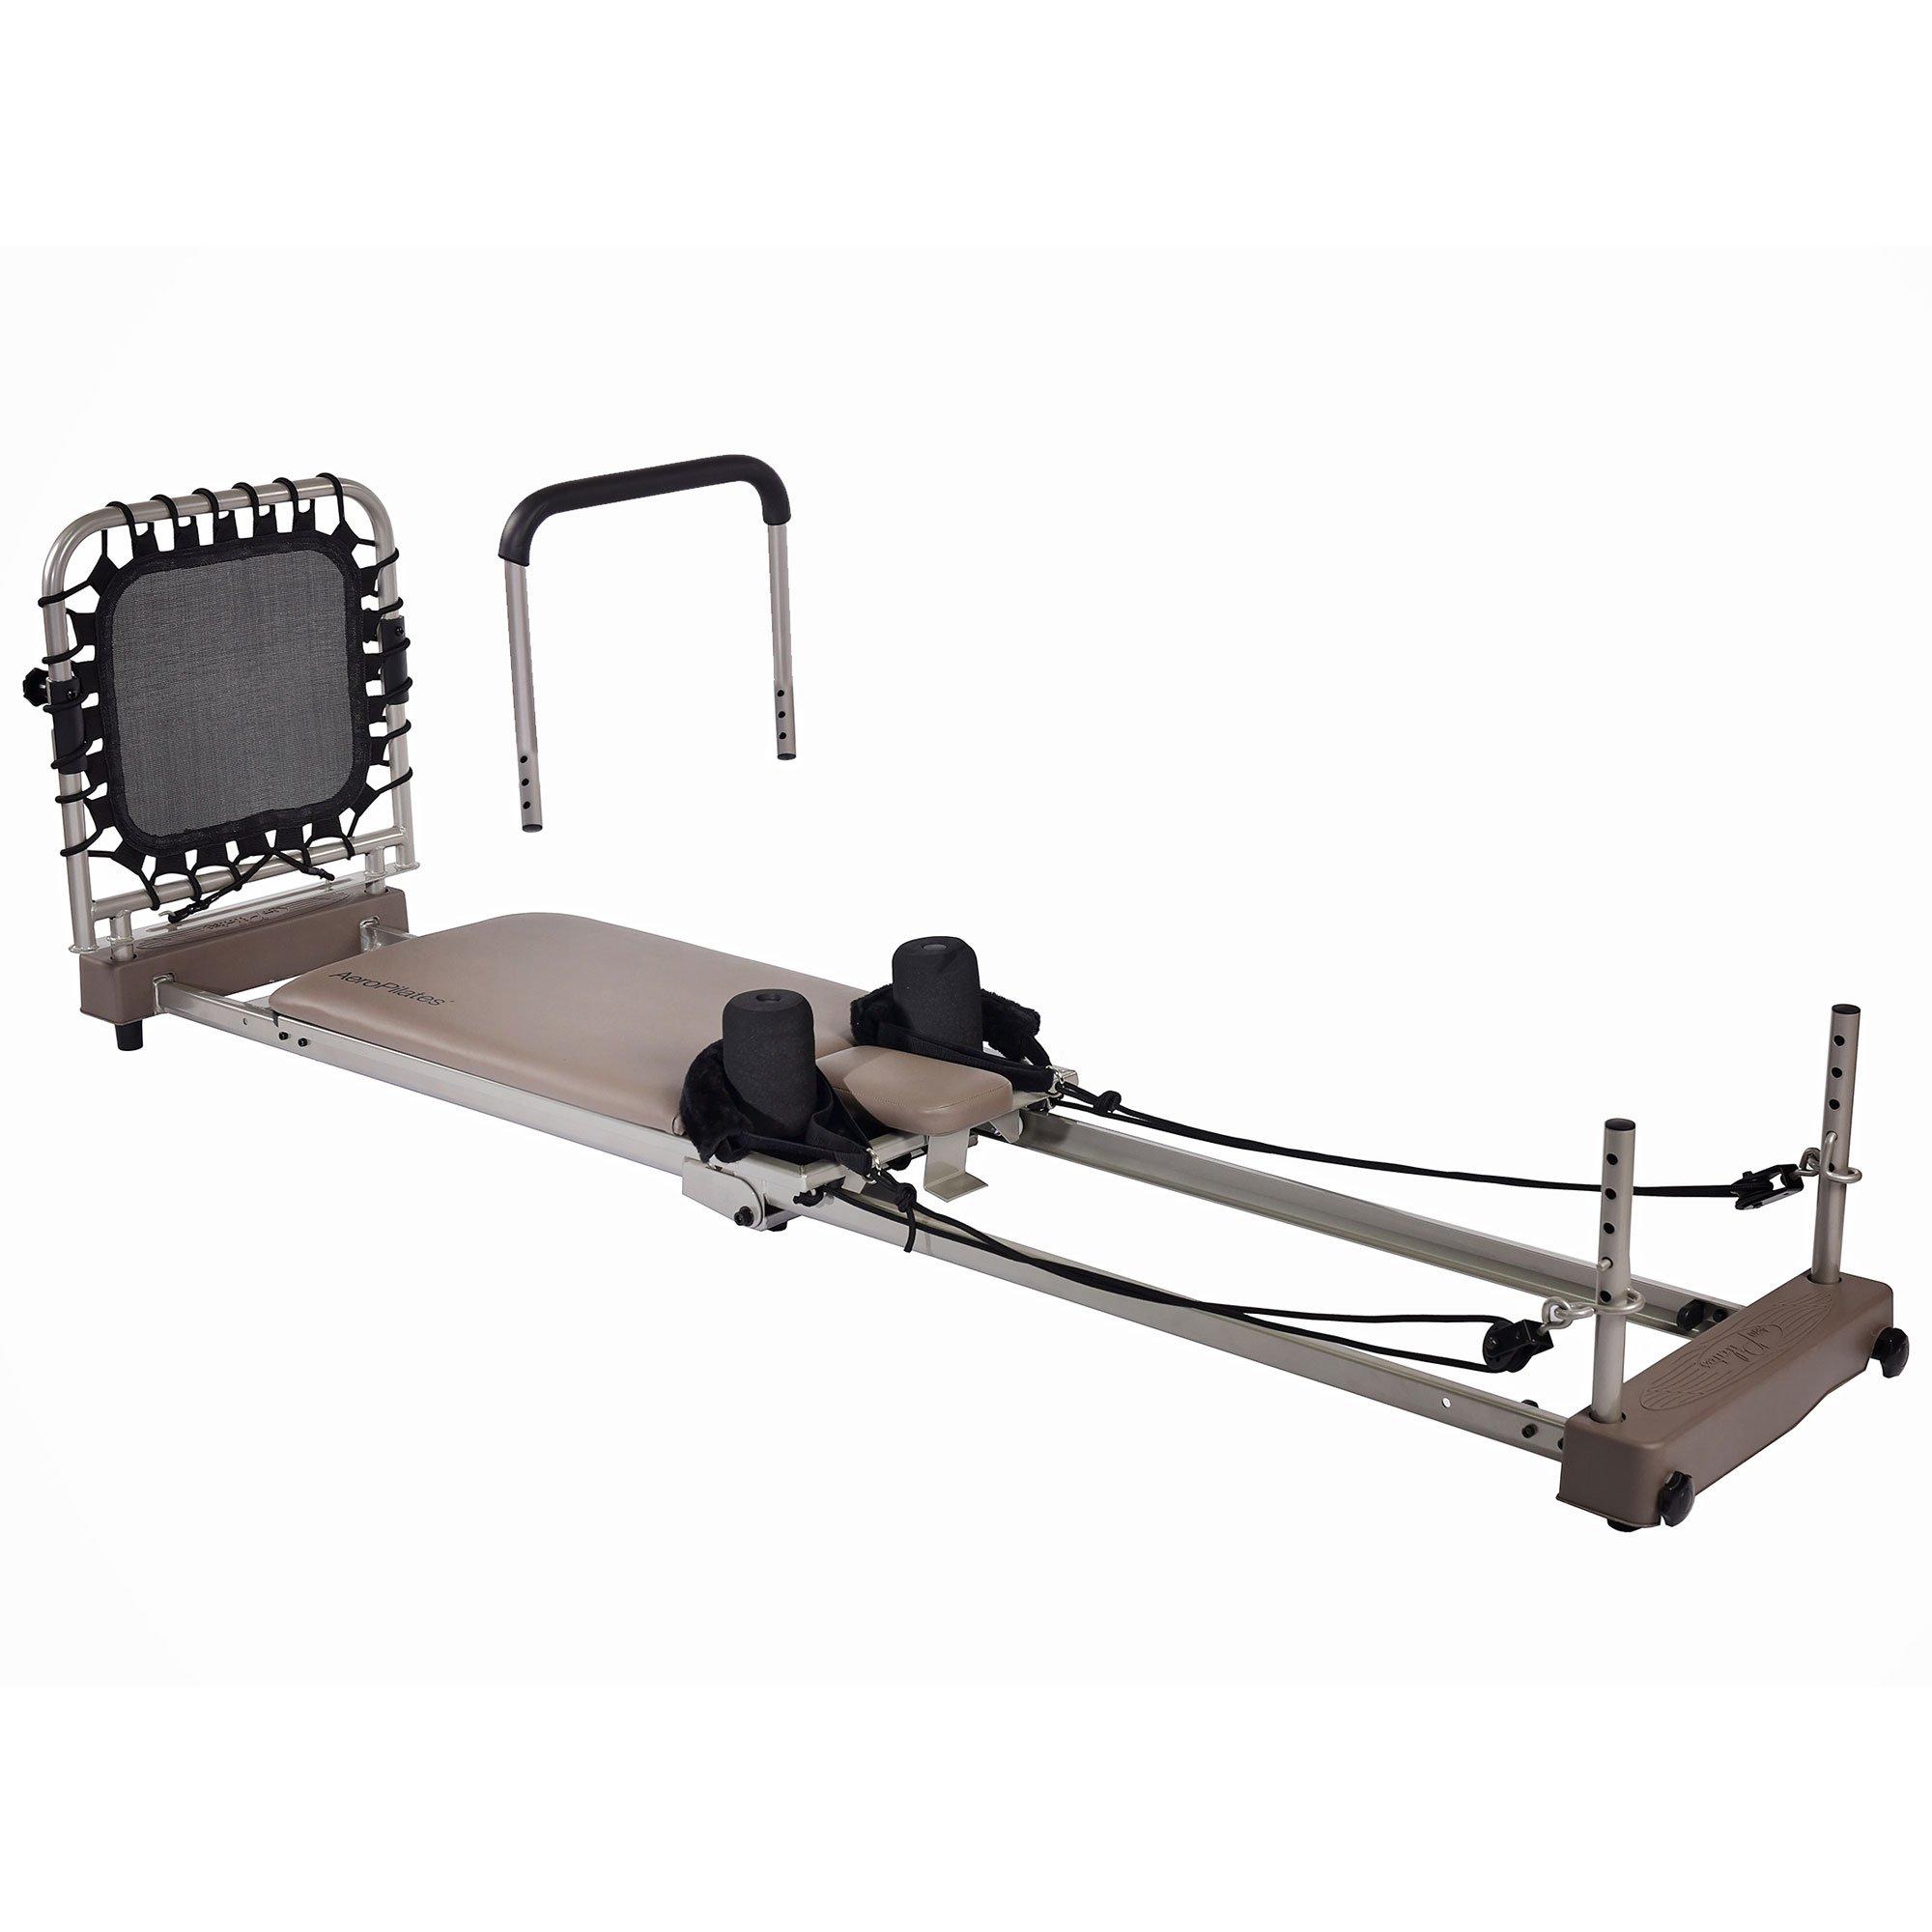 Stamina AeroPilates Reformer 369 Workout Fitness Machine with Cardio Rebounder by Stamina